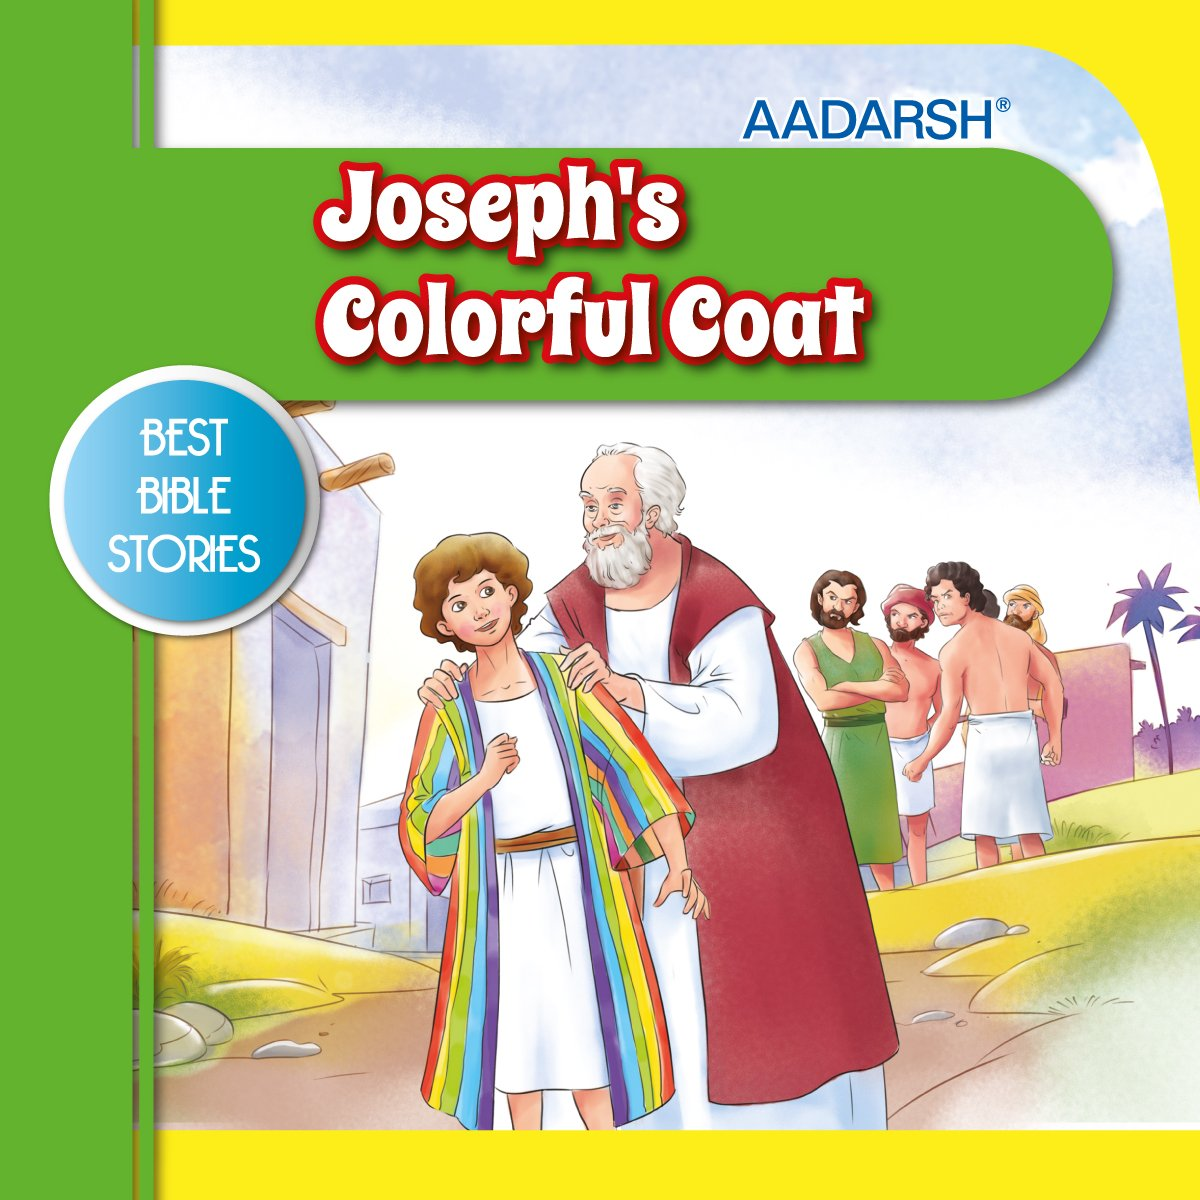 Joseph's Colorful Coat: Bible Stories (Best Bible Stories) ebook